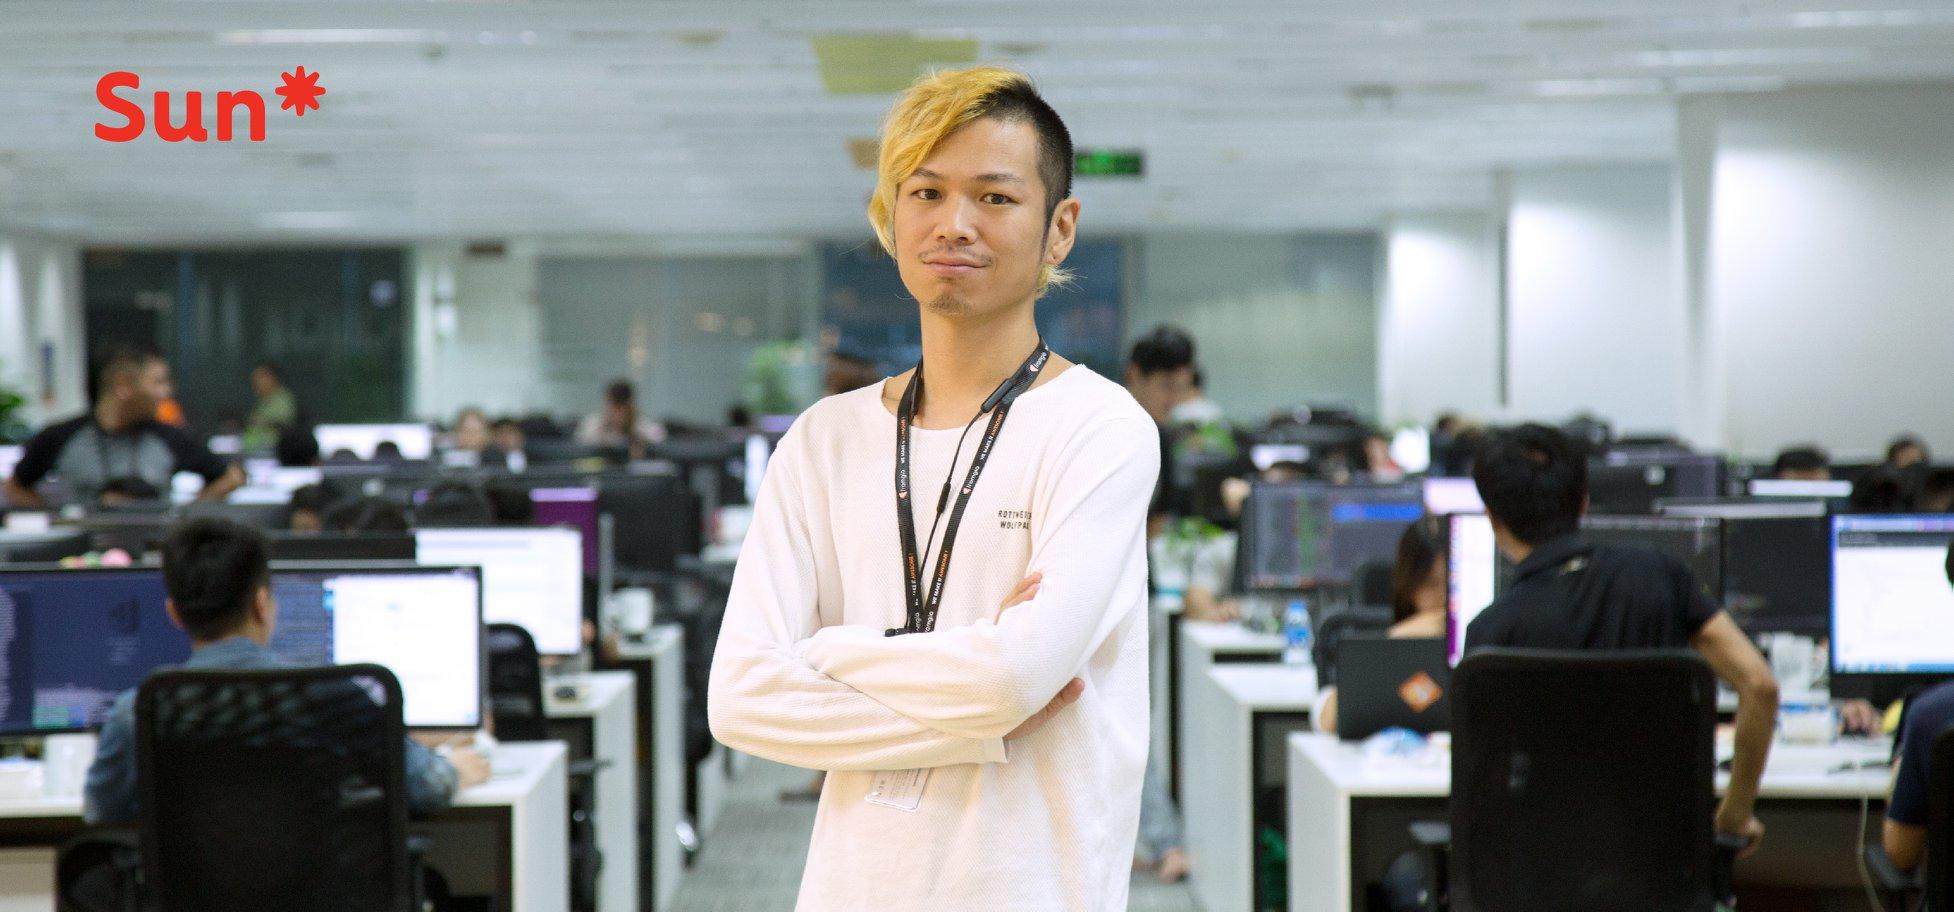 Mr. Taihei Kobayashi